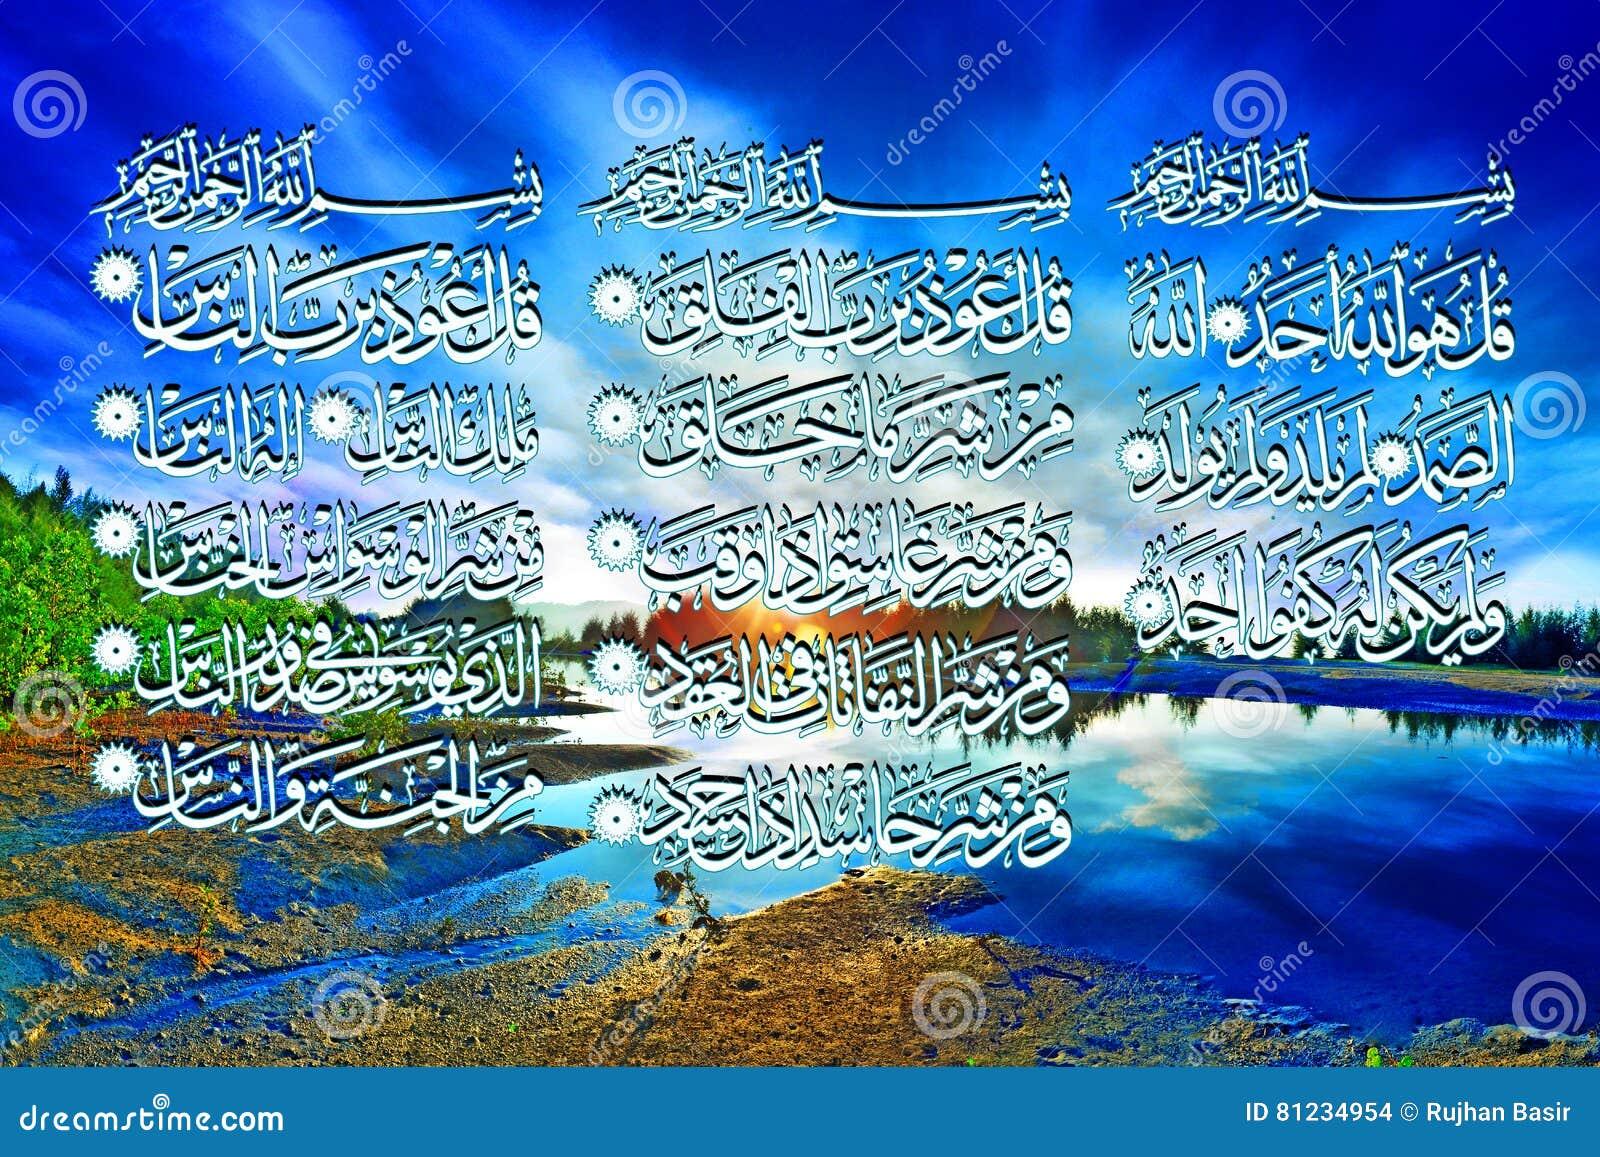 Calligraphy Of Surah Al Ikhlas Al Falaq And An Nas Stock